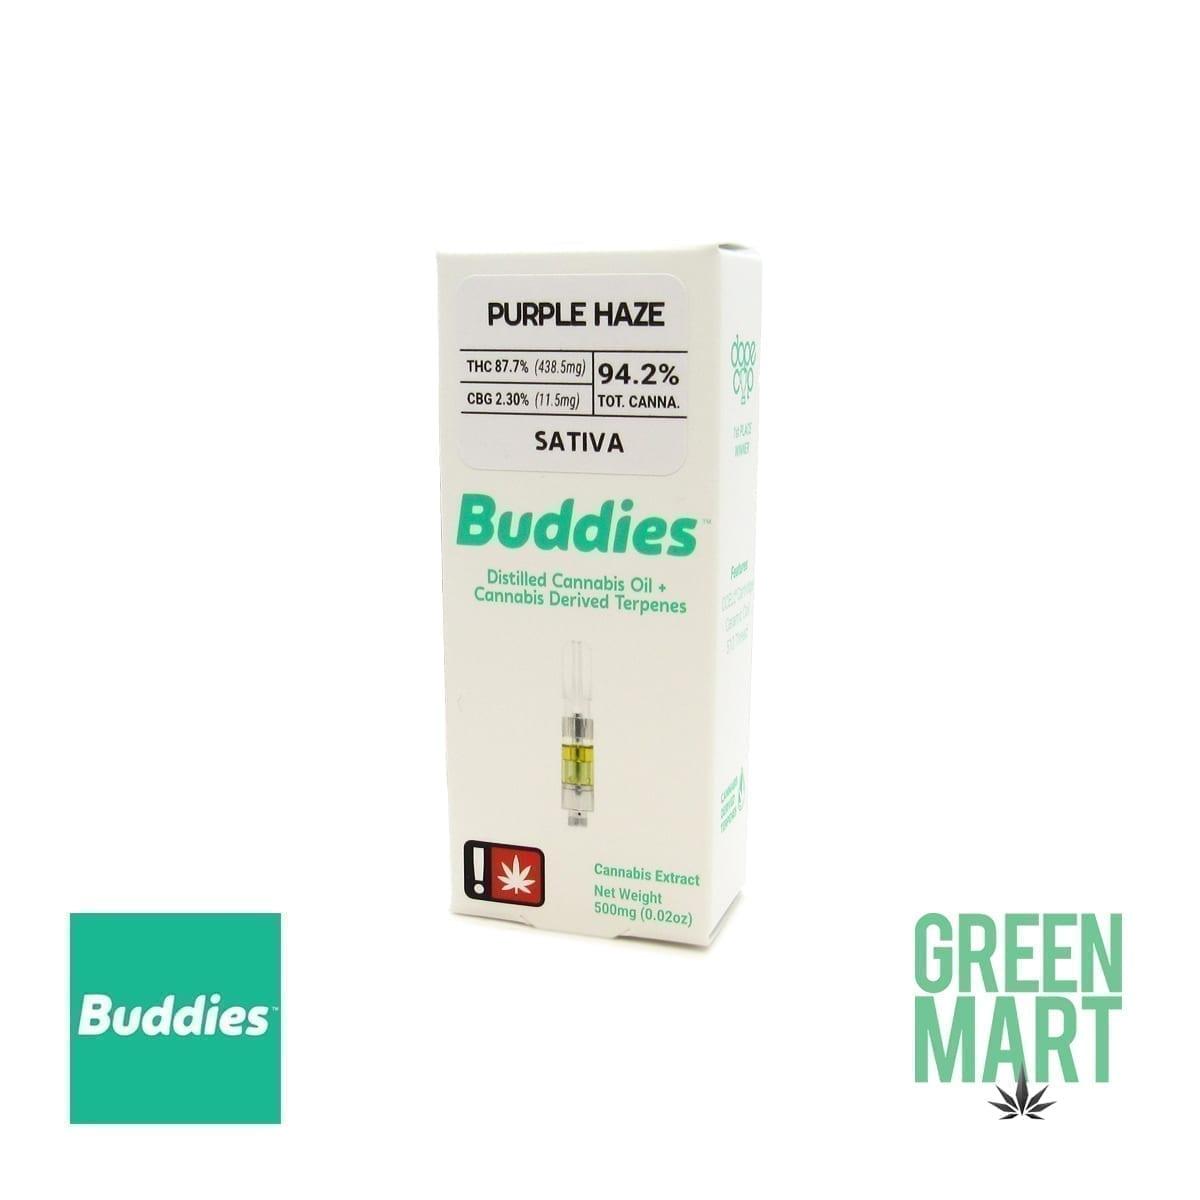 Buddies Brand Distillate Cartridge - Purple Haze